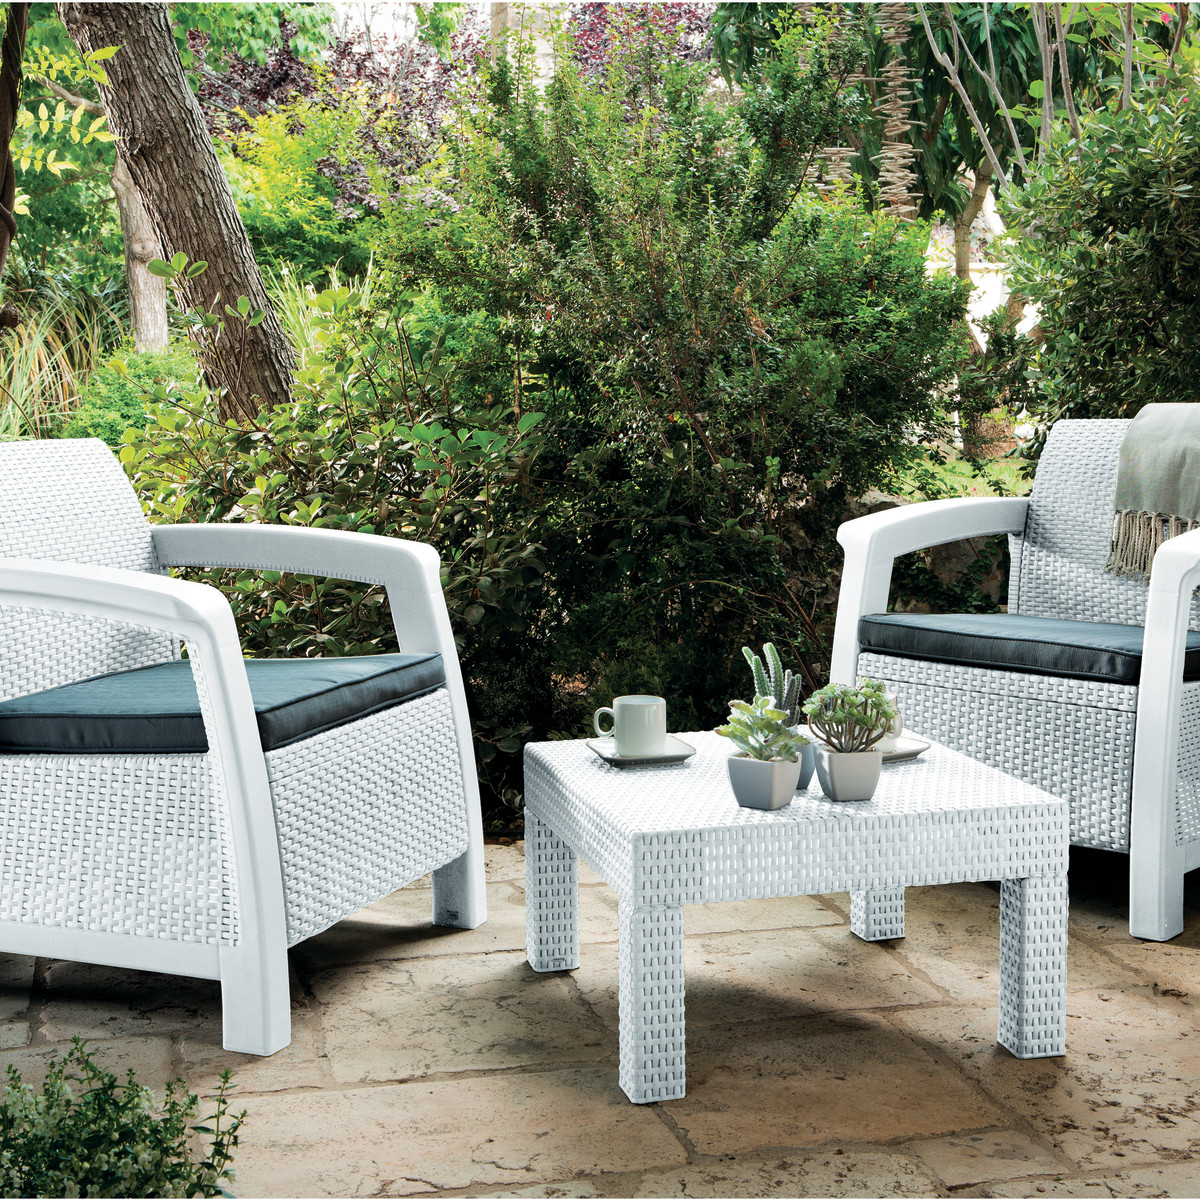 Arredare giardini angolo pranzo in giardino with arredare - Piastrelle plastica giardino leroy merlin ...